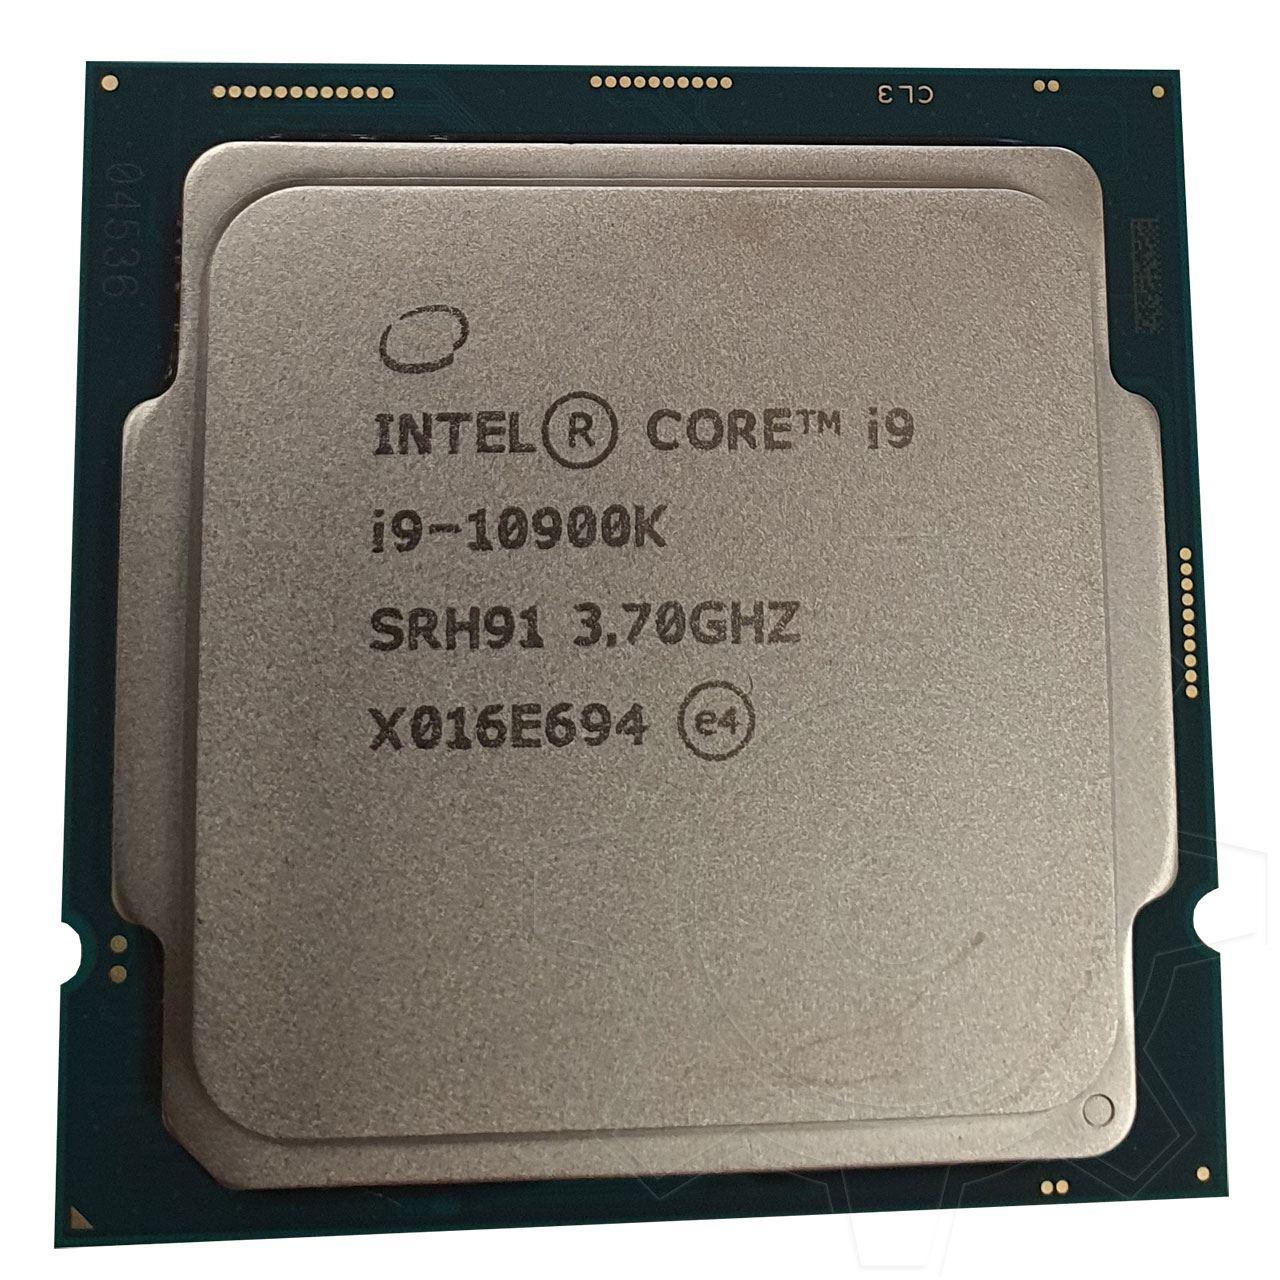 Intel Core i9 10900K 10x 3.70Ghz So.1200 Tray !! Endlich wieder lieferbar !!